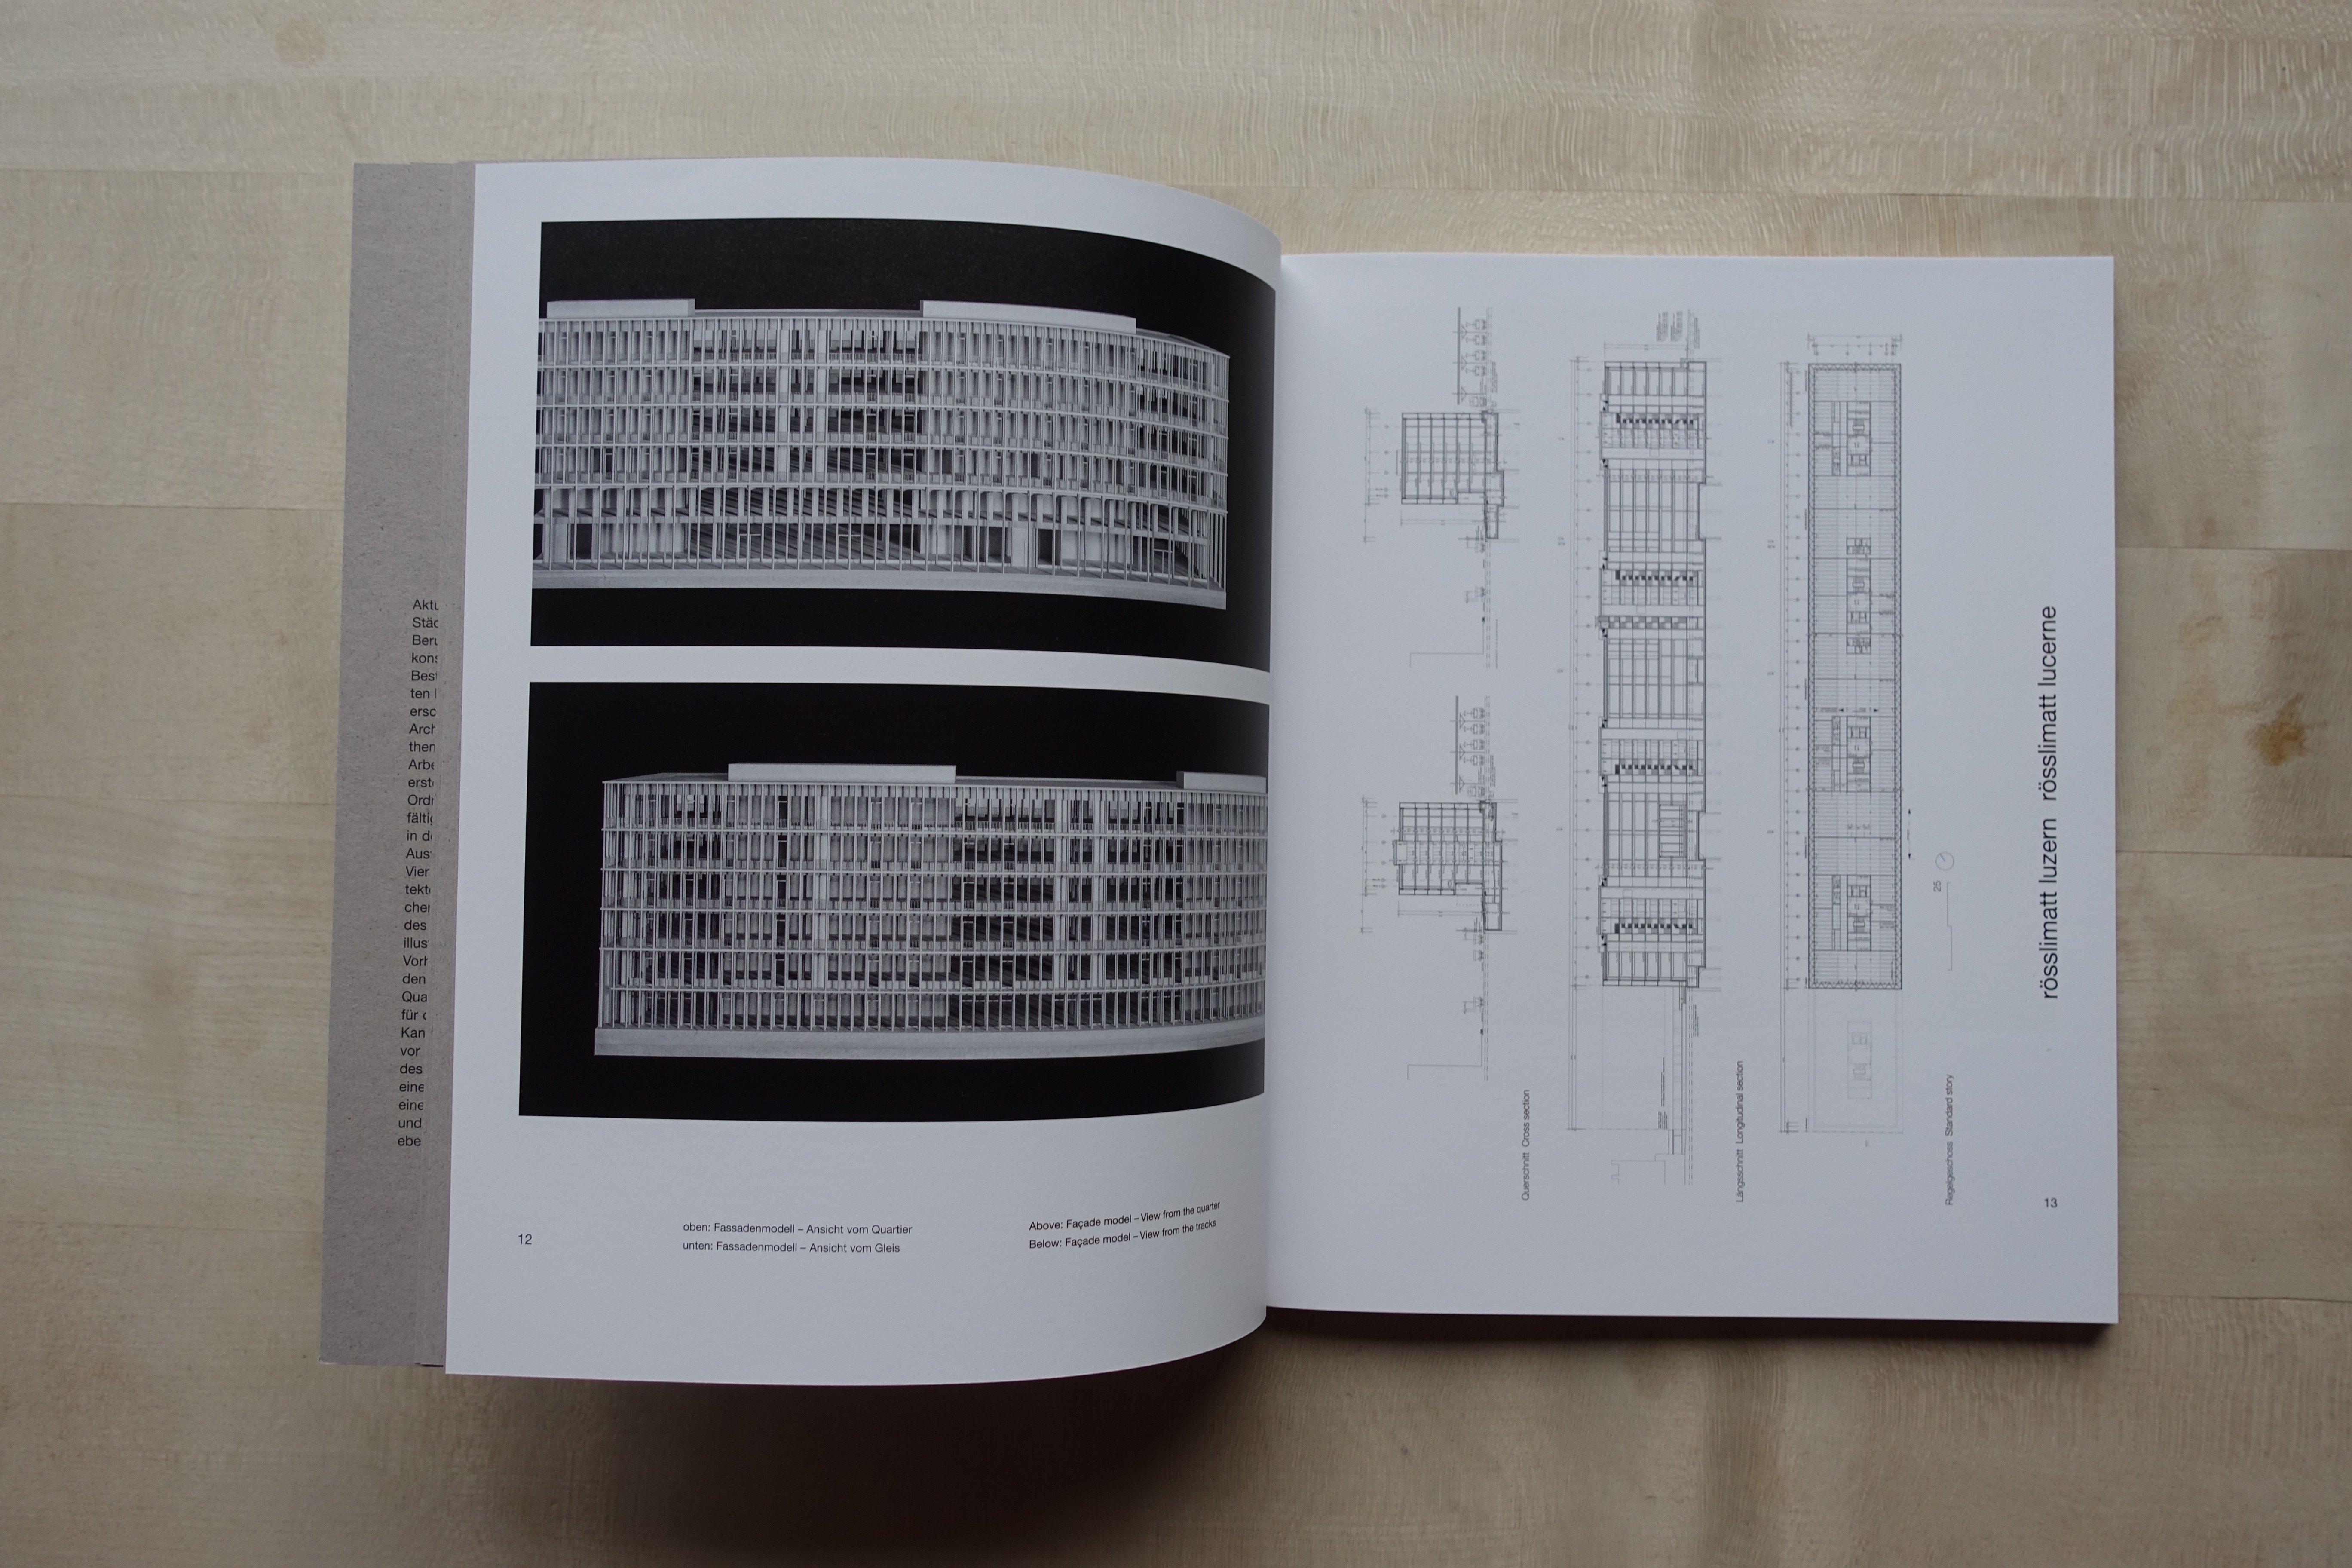 Katalog Rolf Mühlethaler, Bildseite (Foto: Gerold Kunz)